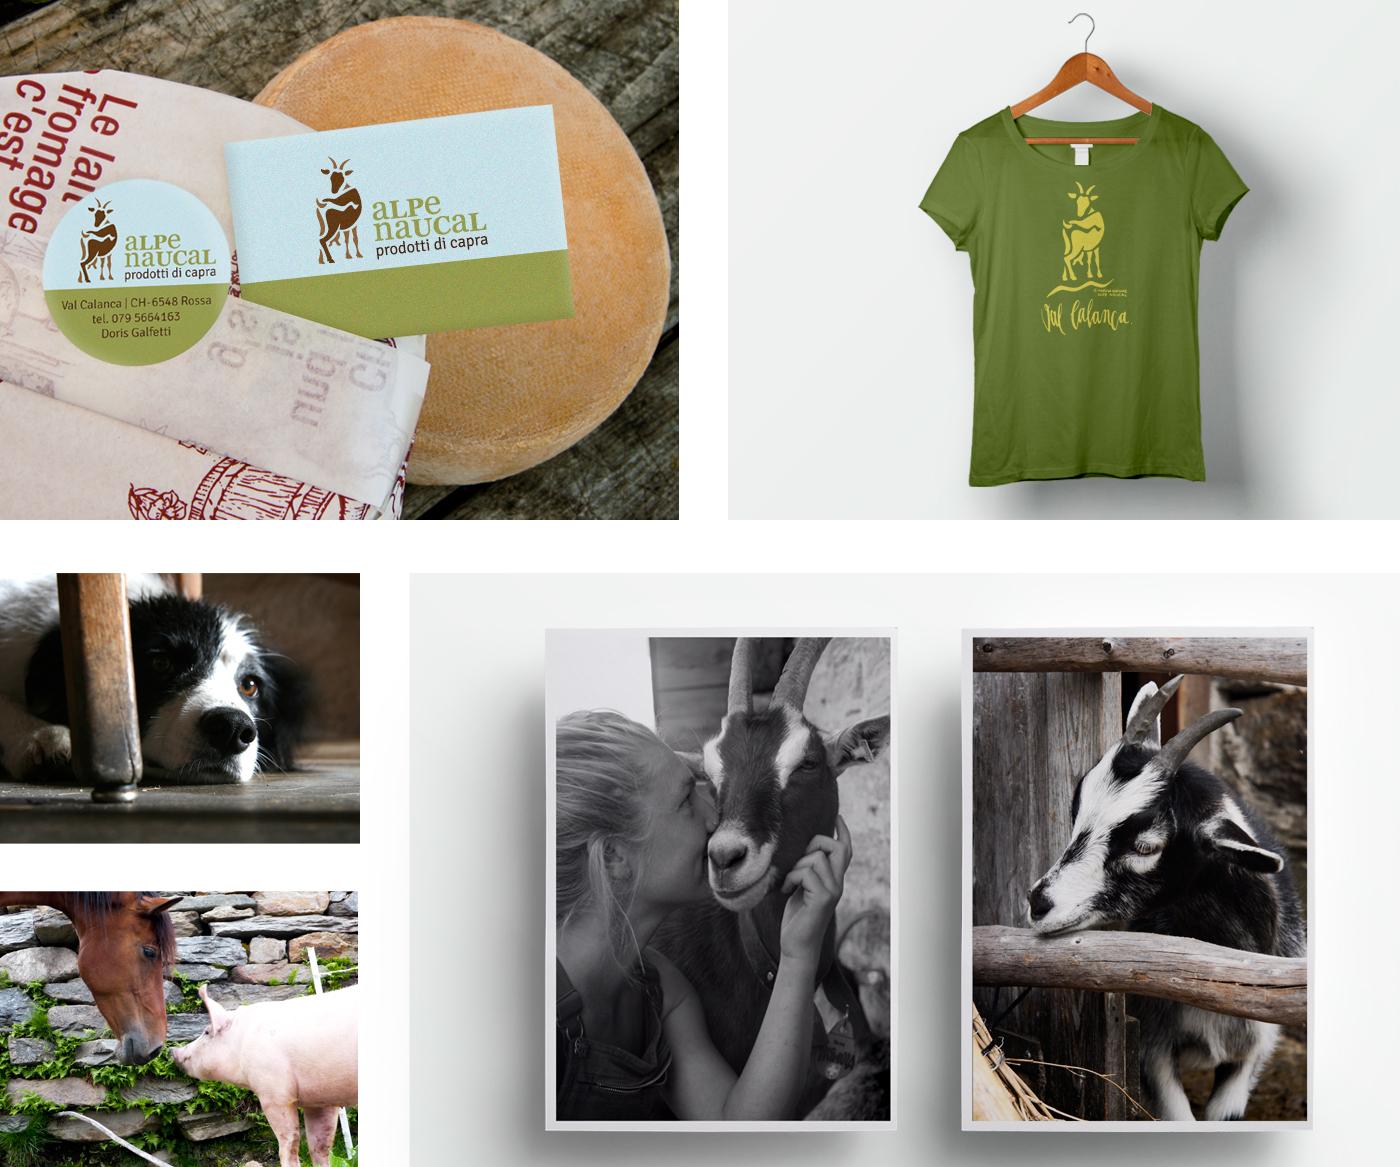 alpe-naucal_shirt_postkarte_etikett_visitenkarte_grafik_design_marina_grimme